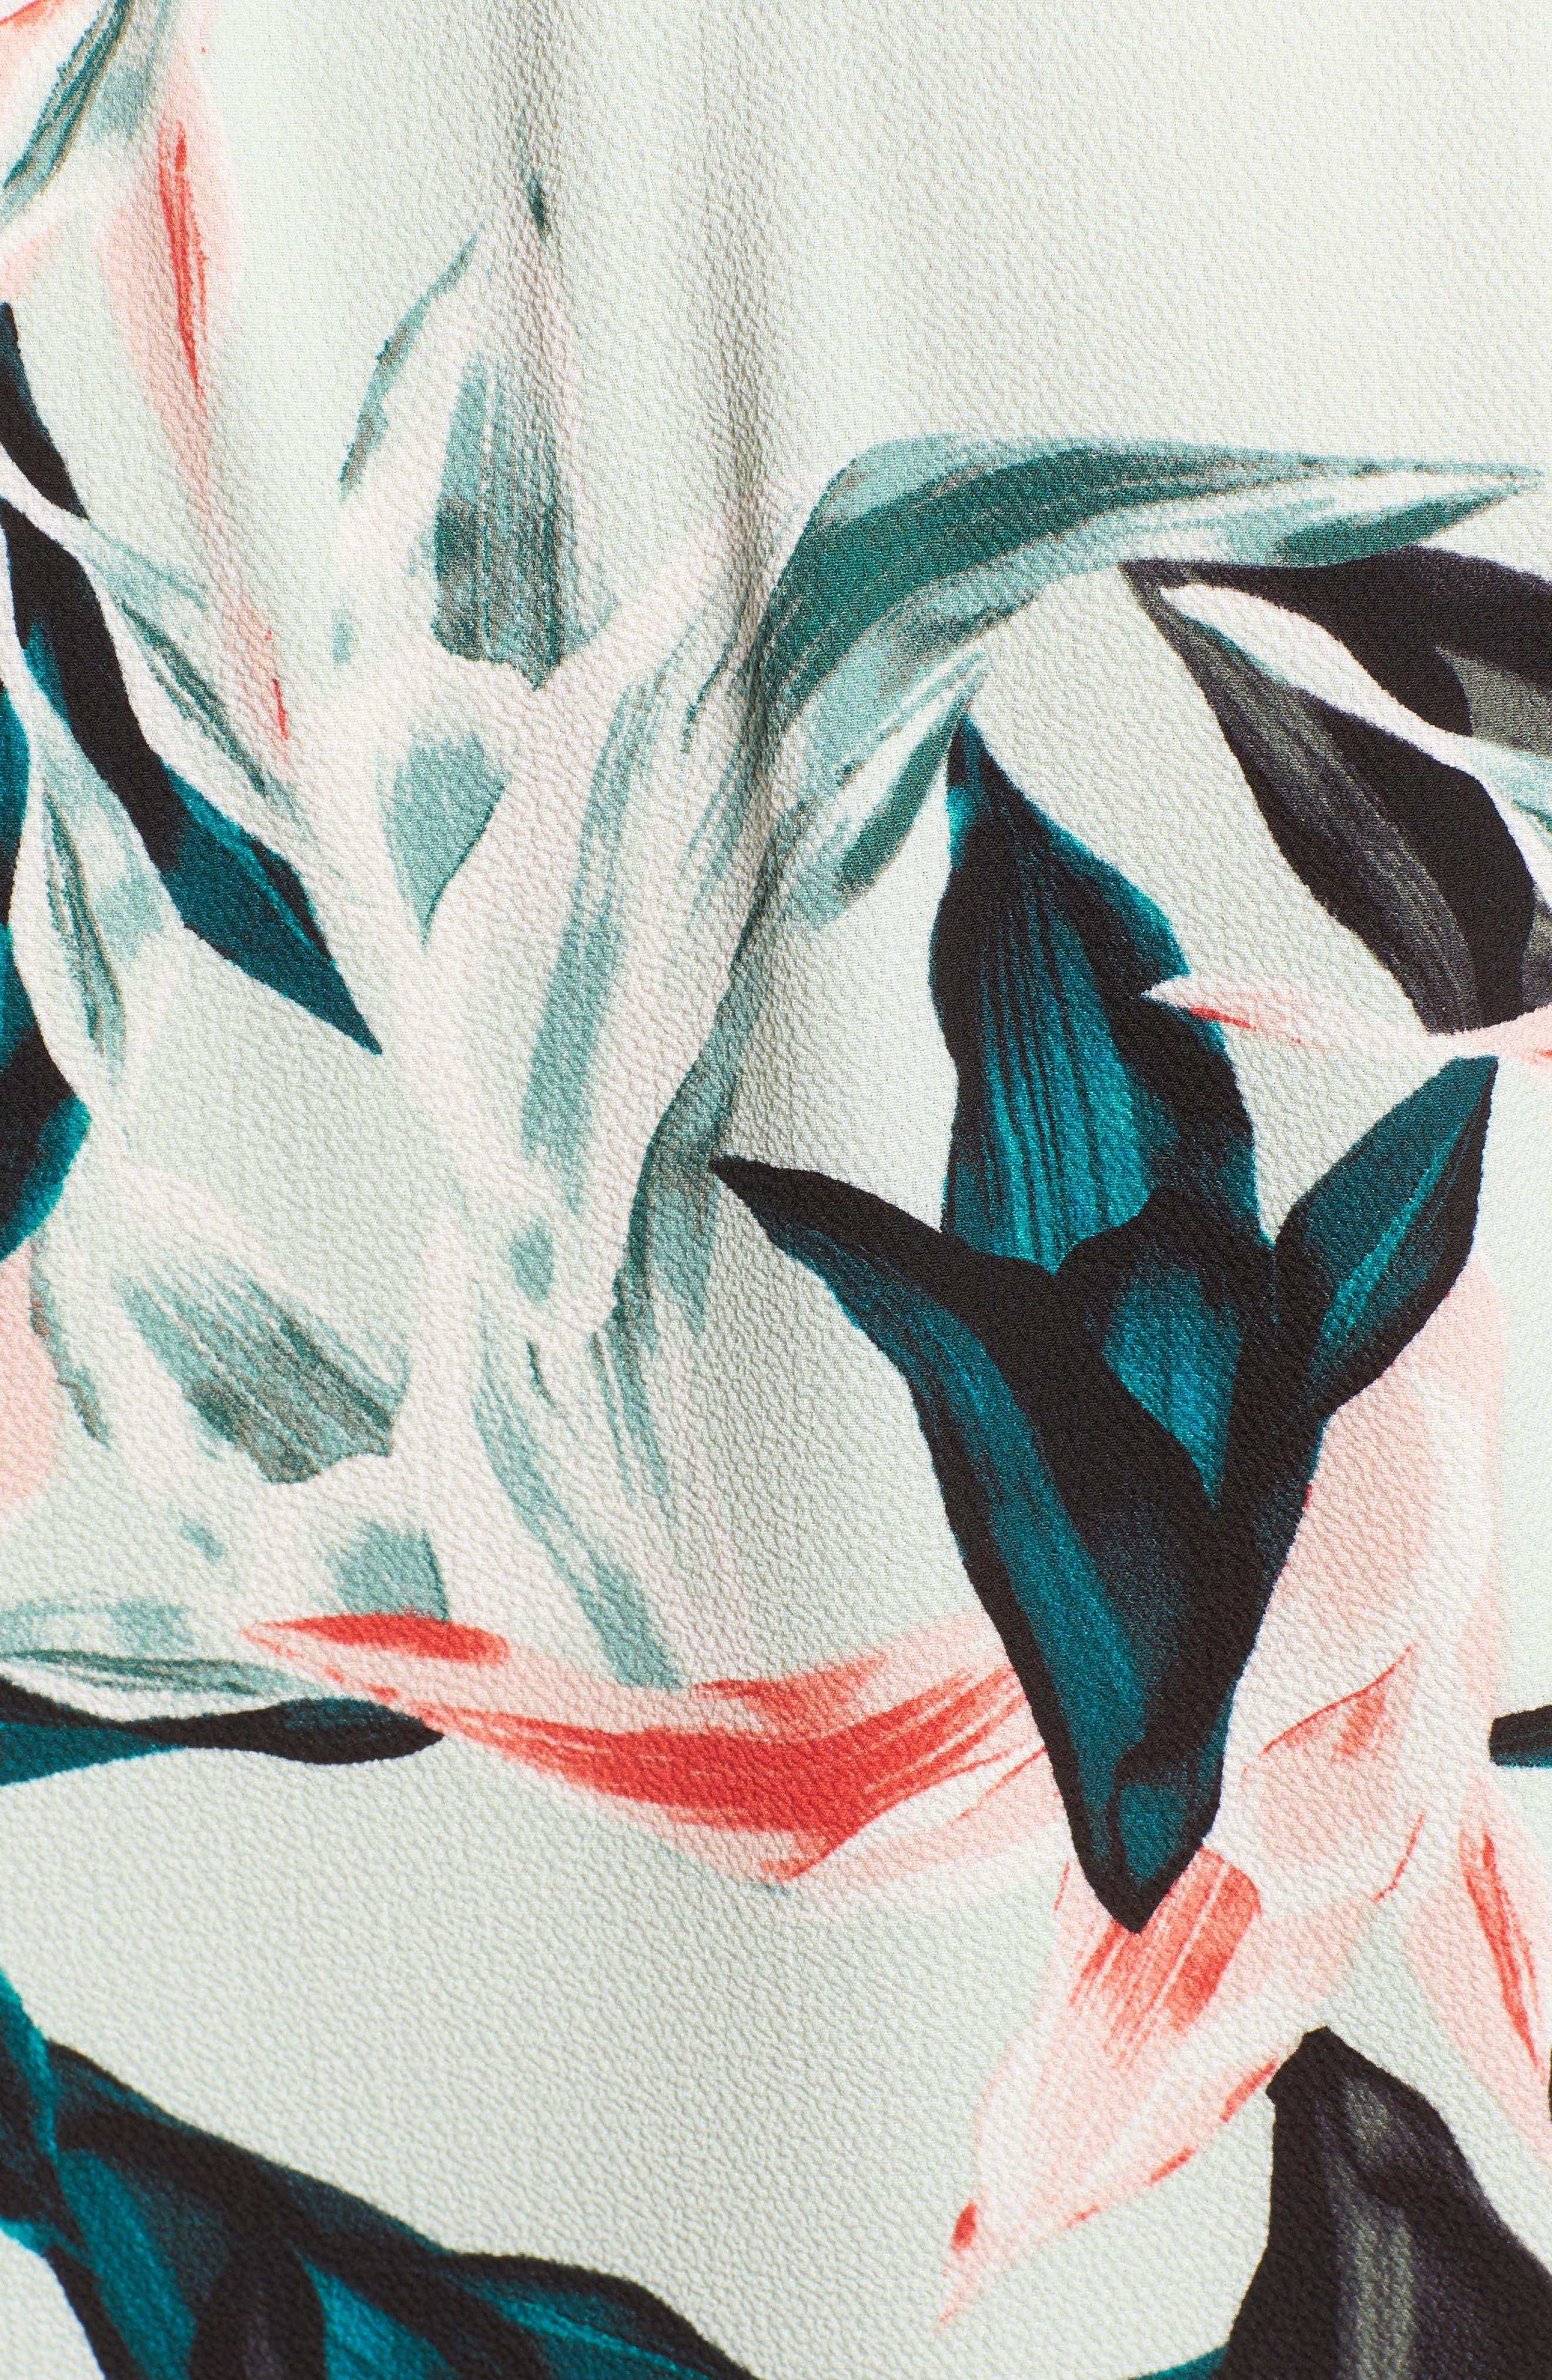 Rainforest Bell Sleeve Top,                             Alternate thumbnail 6, color,                             449-Marine Salt